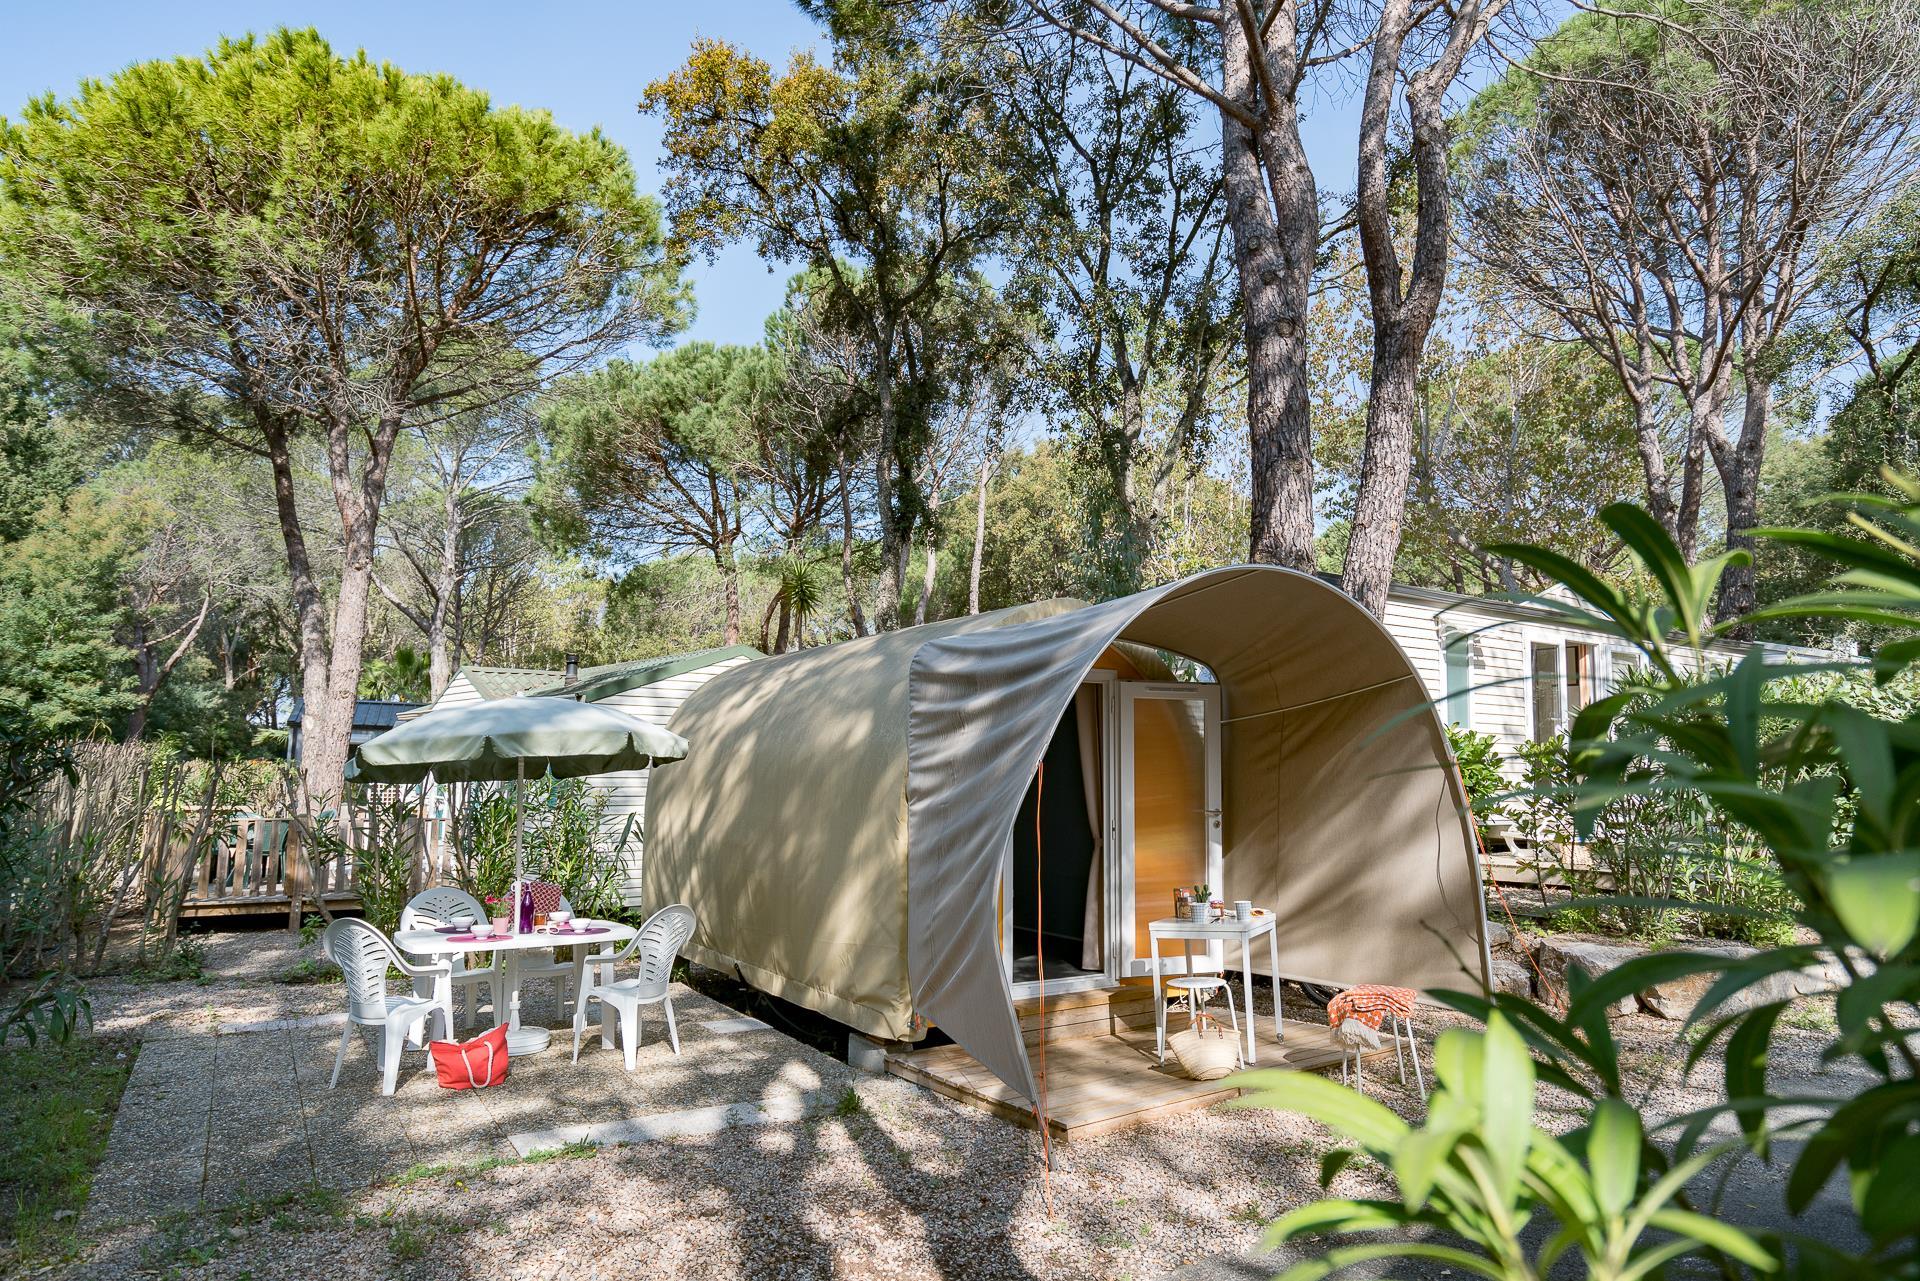 Location - Coco Sweet 1 Chambre * - Camping Sandaya Douce Quiétude